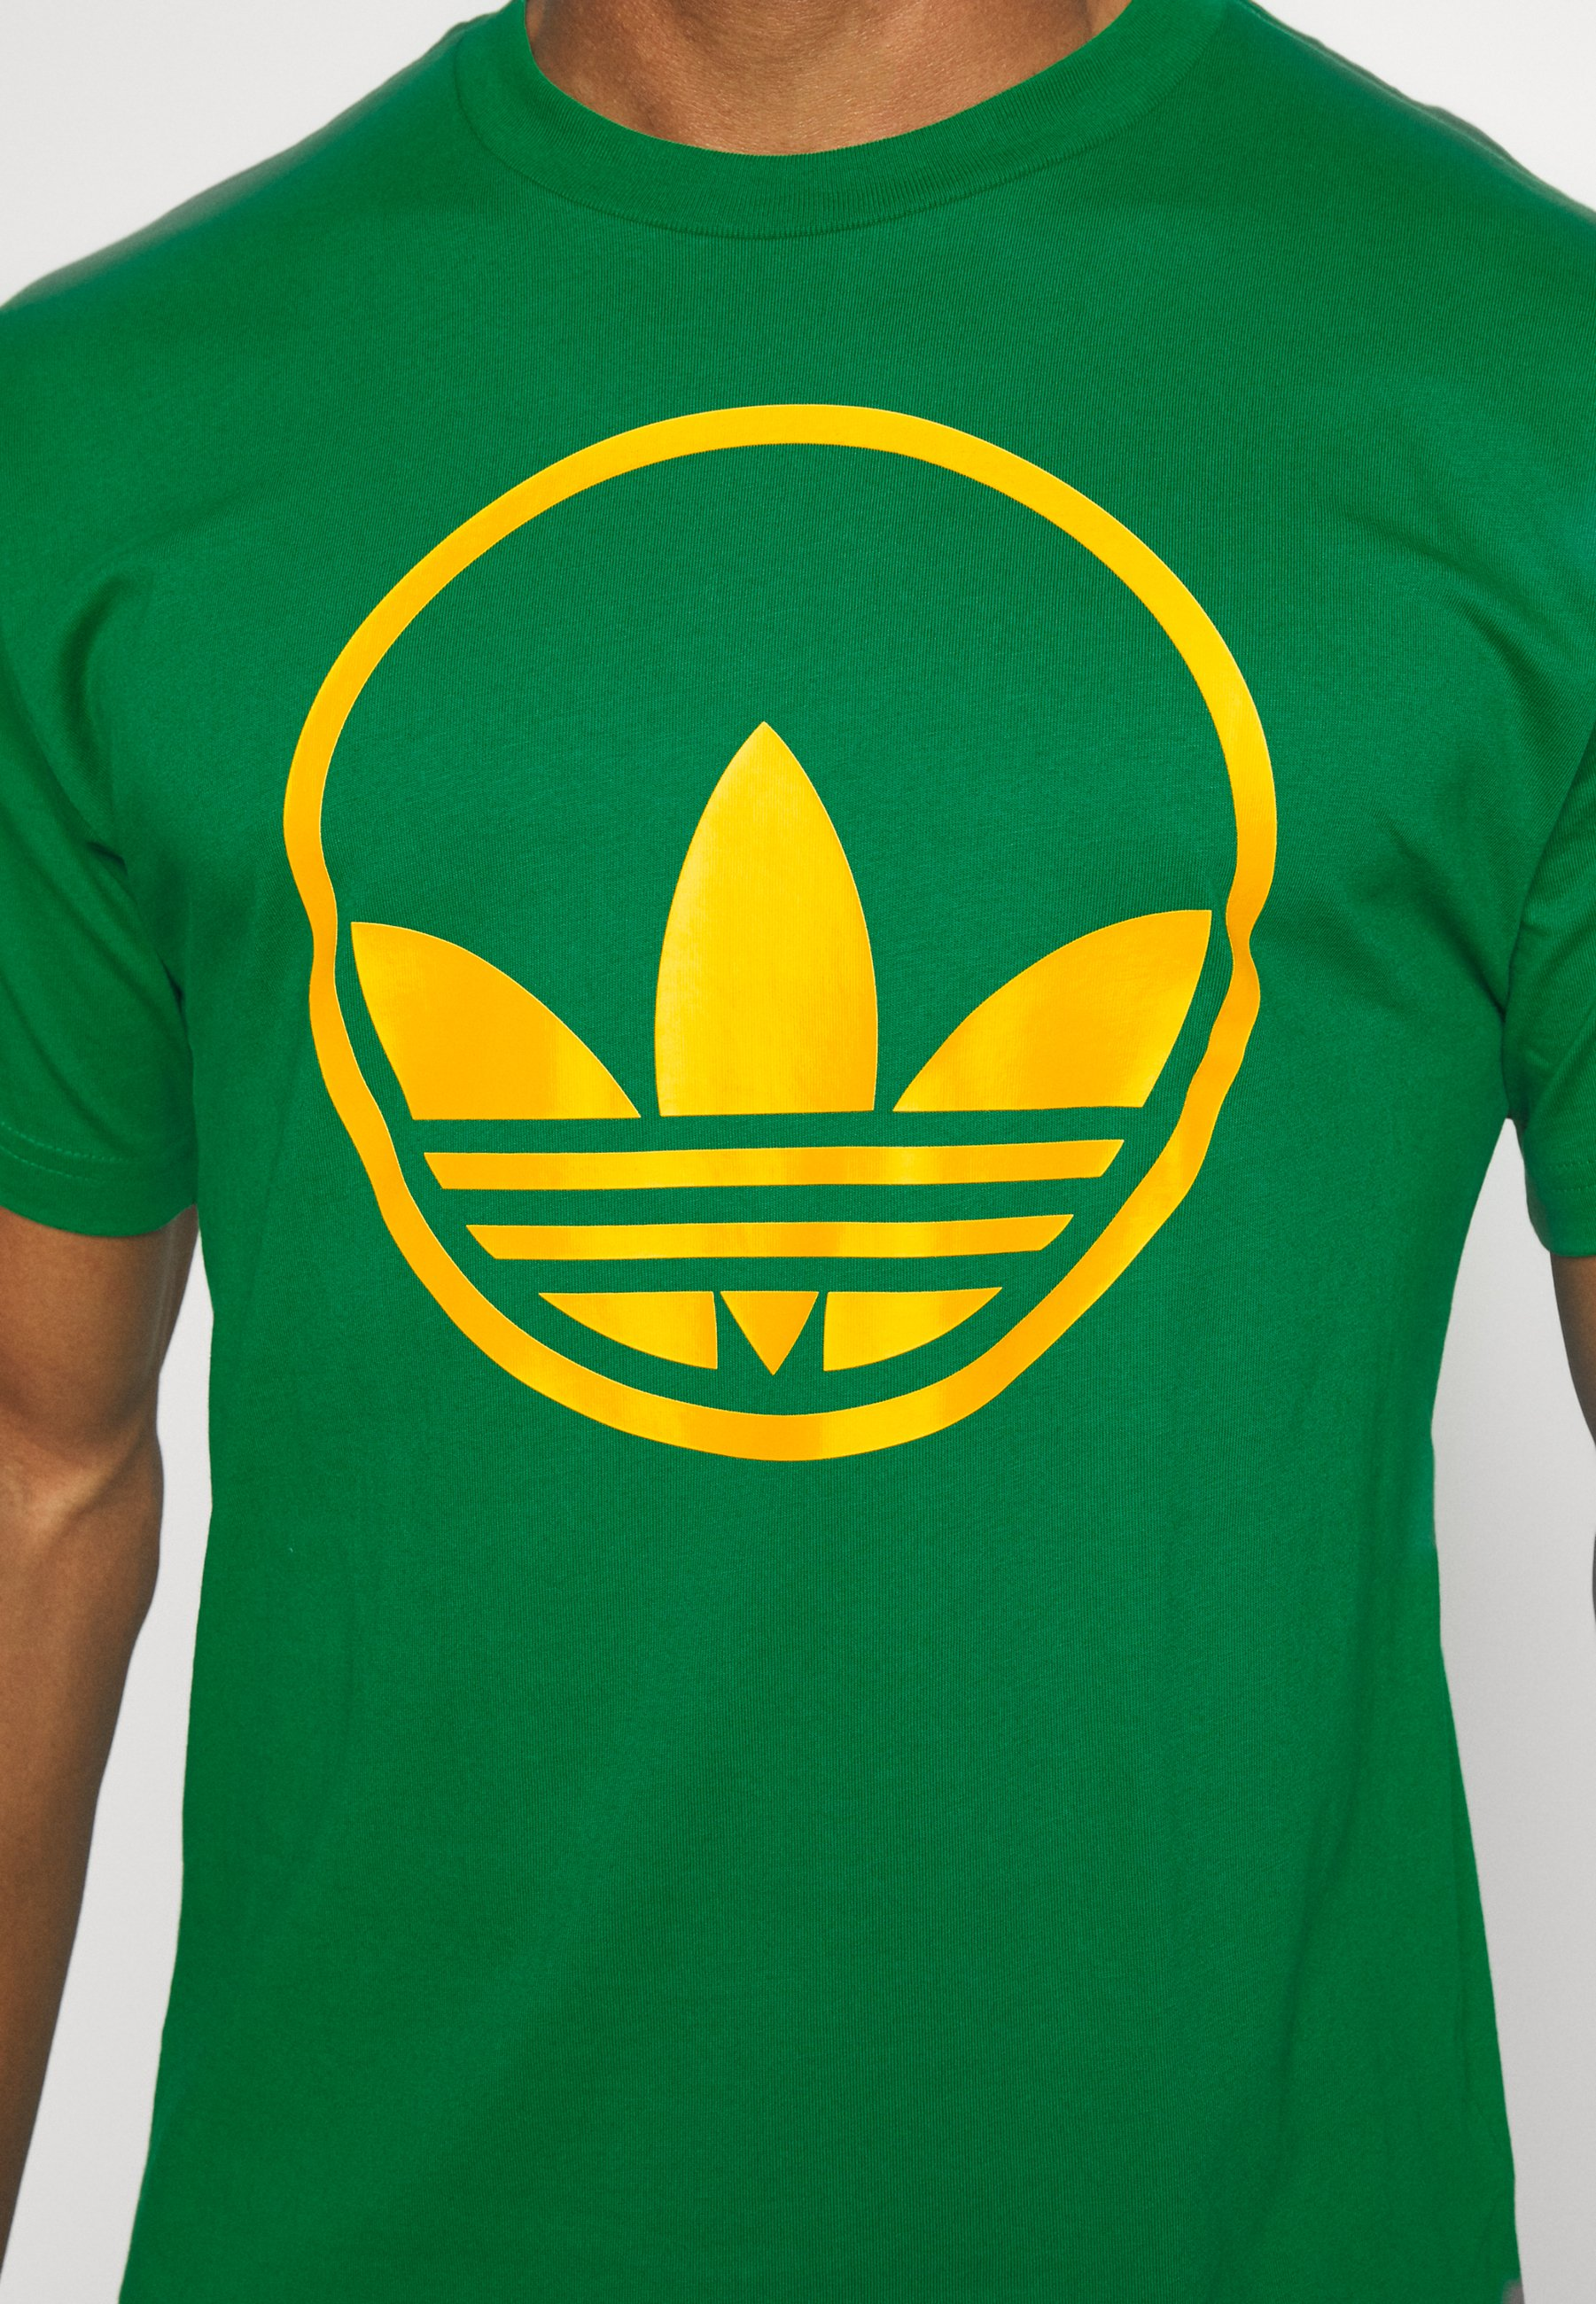 Adidas Originals Circle Trefoil - T-shirts Med Print Green/grønn